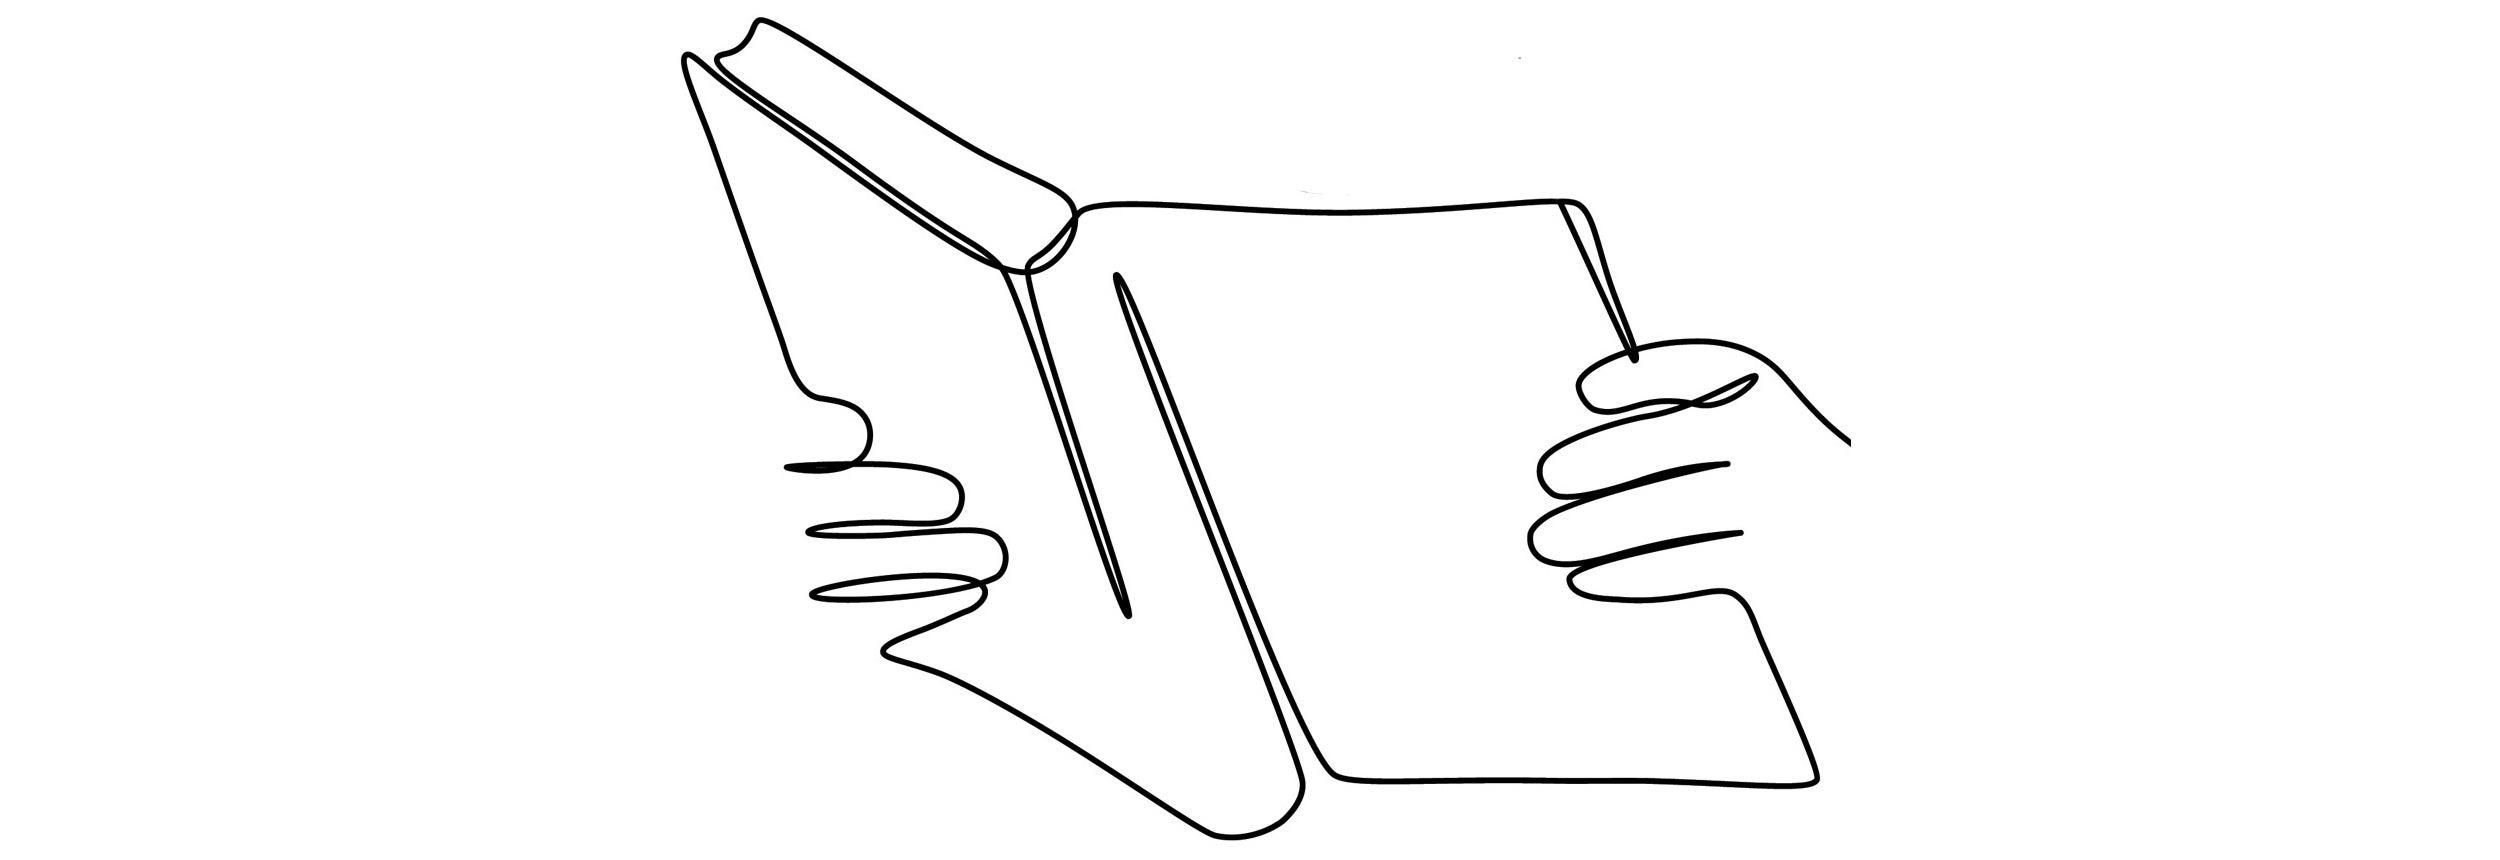 Sketch of book.